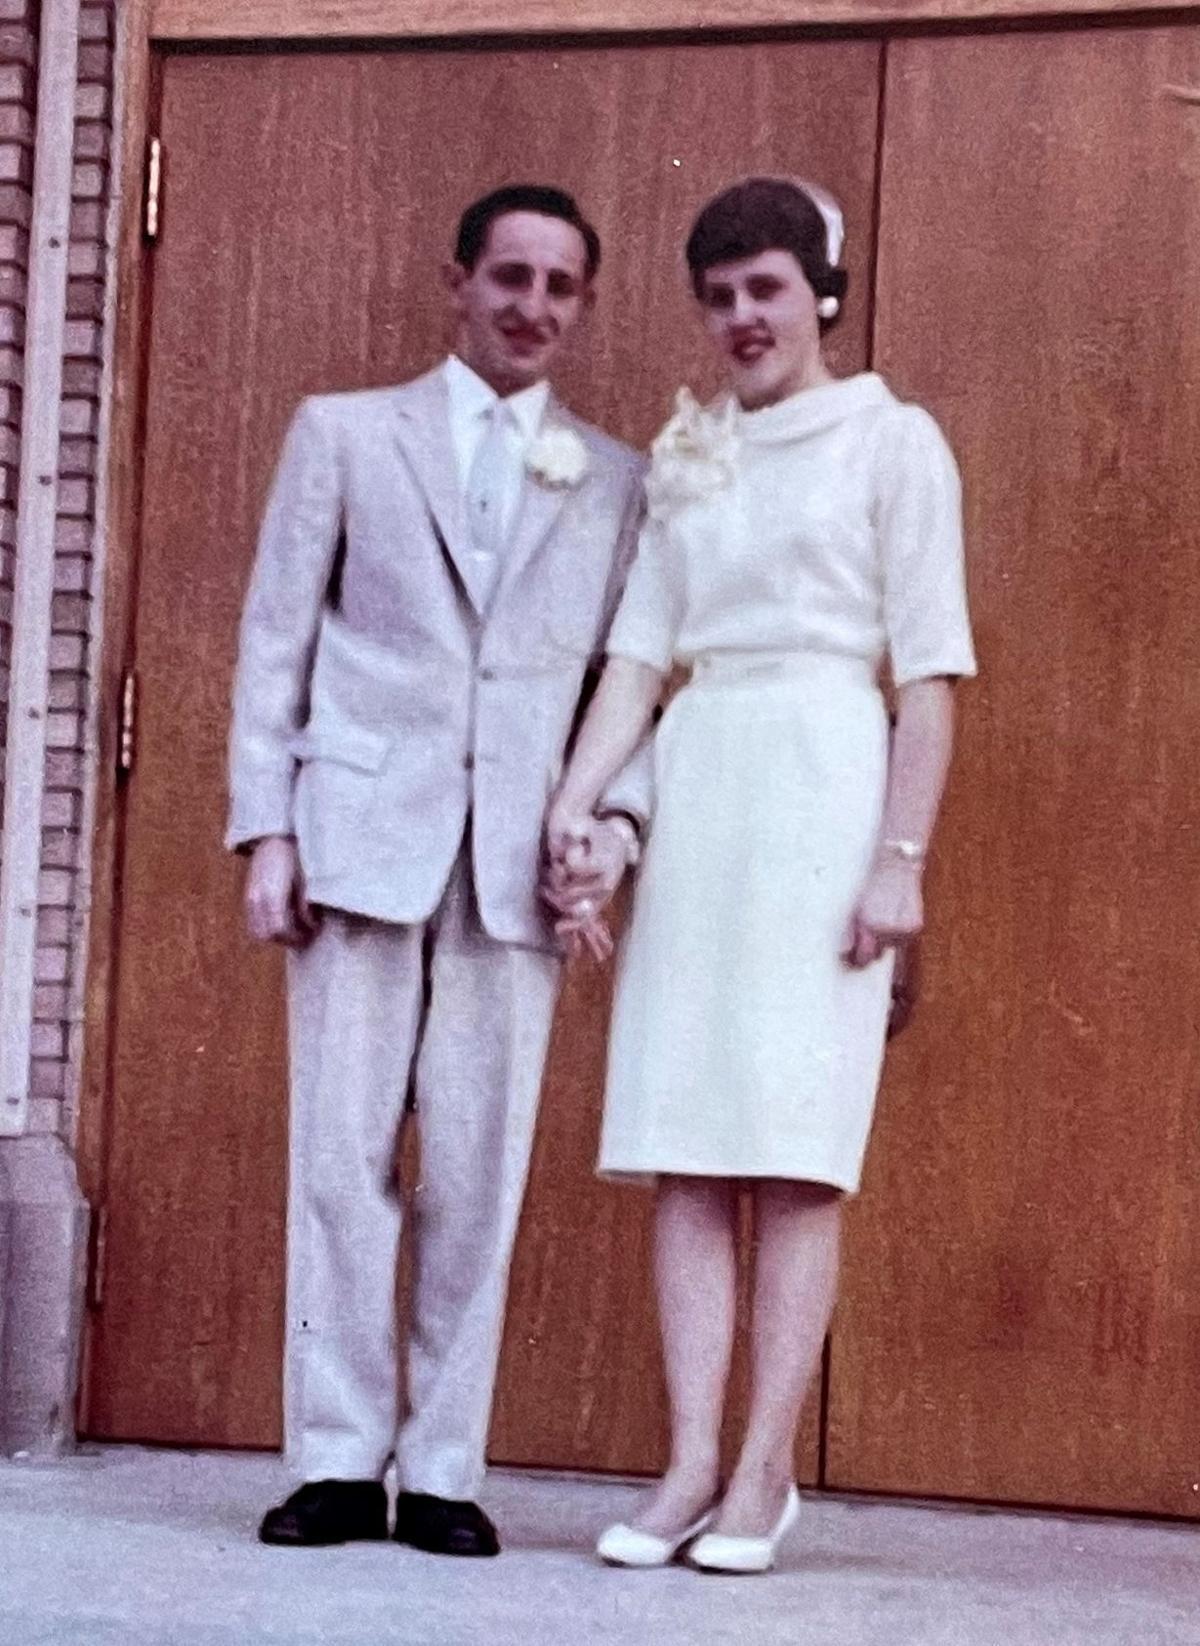 Nancy and Joe Pirami in 1960